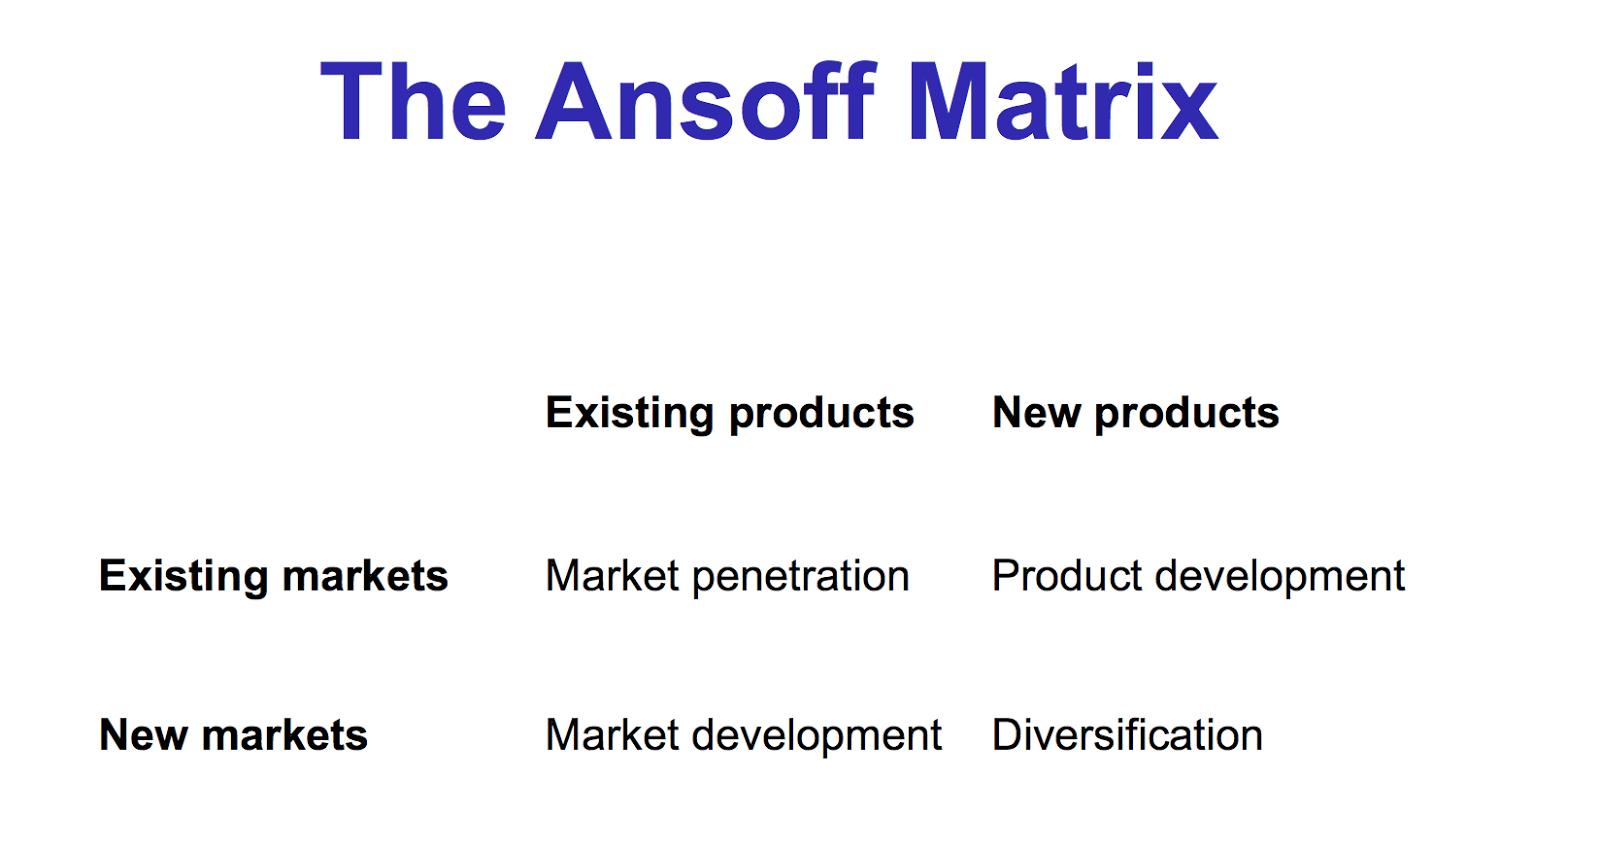 ansoff matrix starbucks